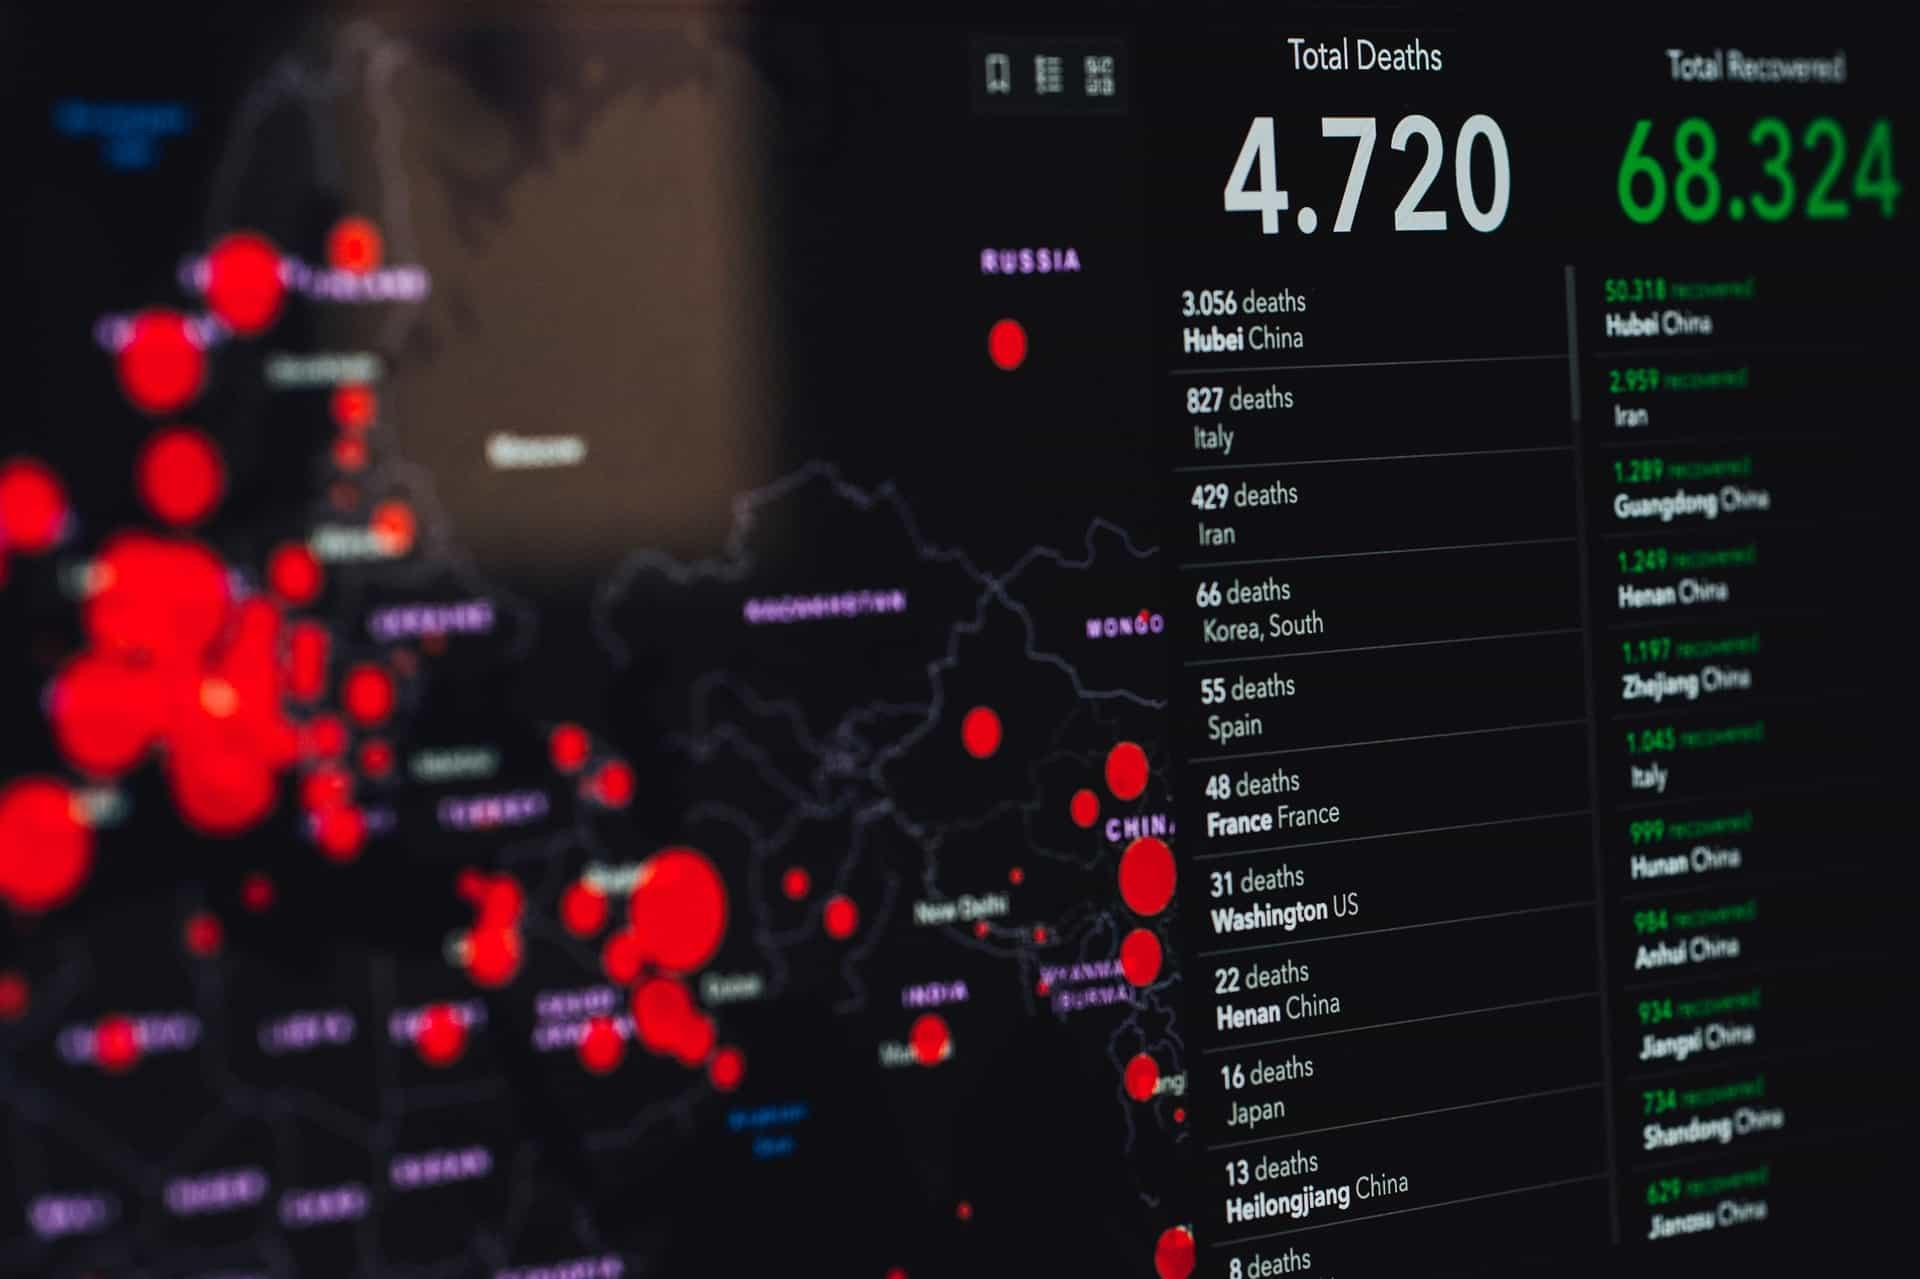 Covid outbreak map